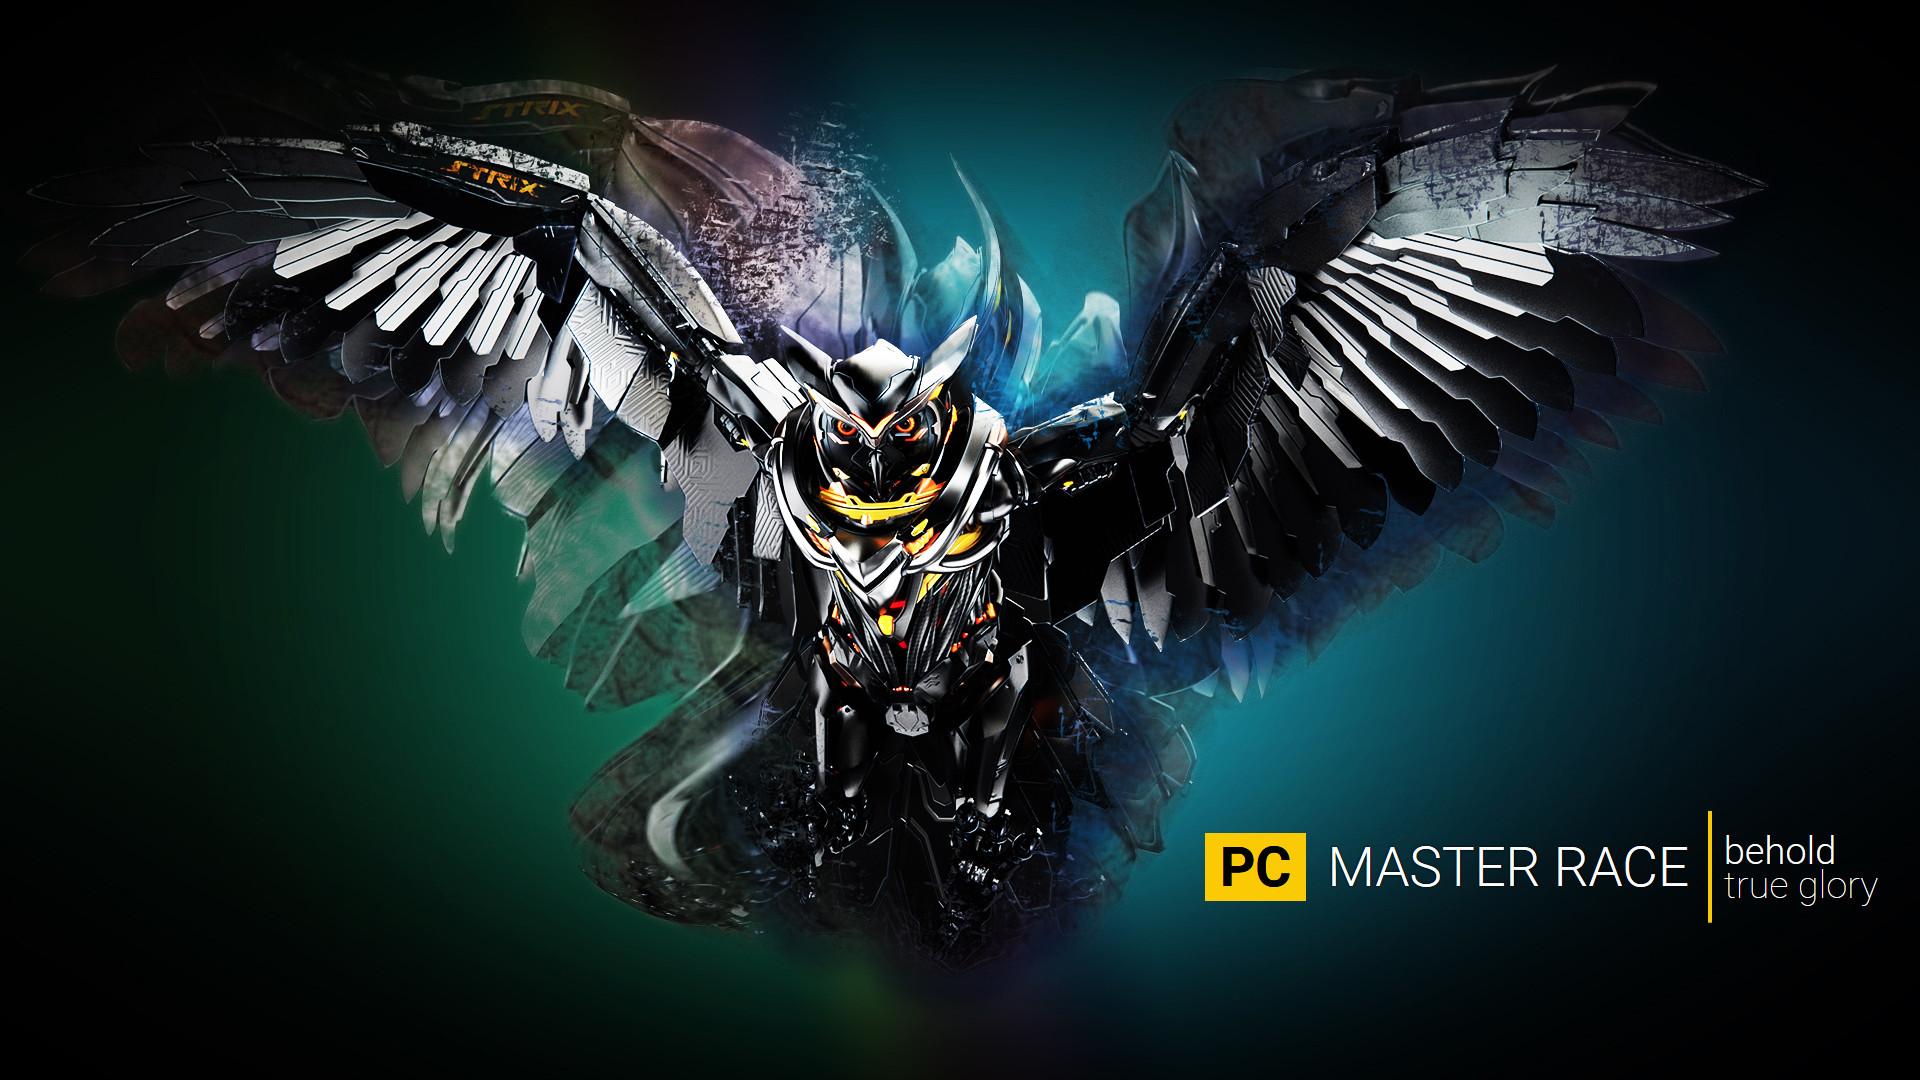 ASUS STRIX wallpaper (PC Master Race)